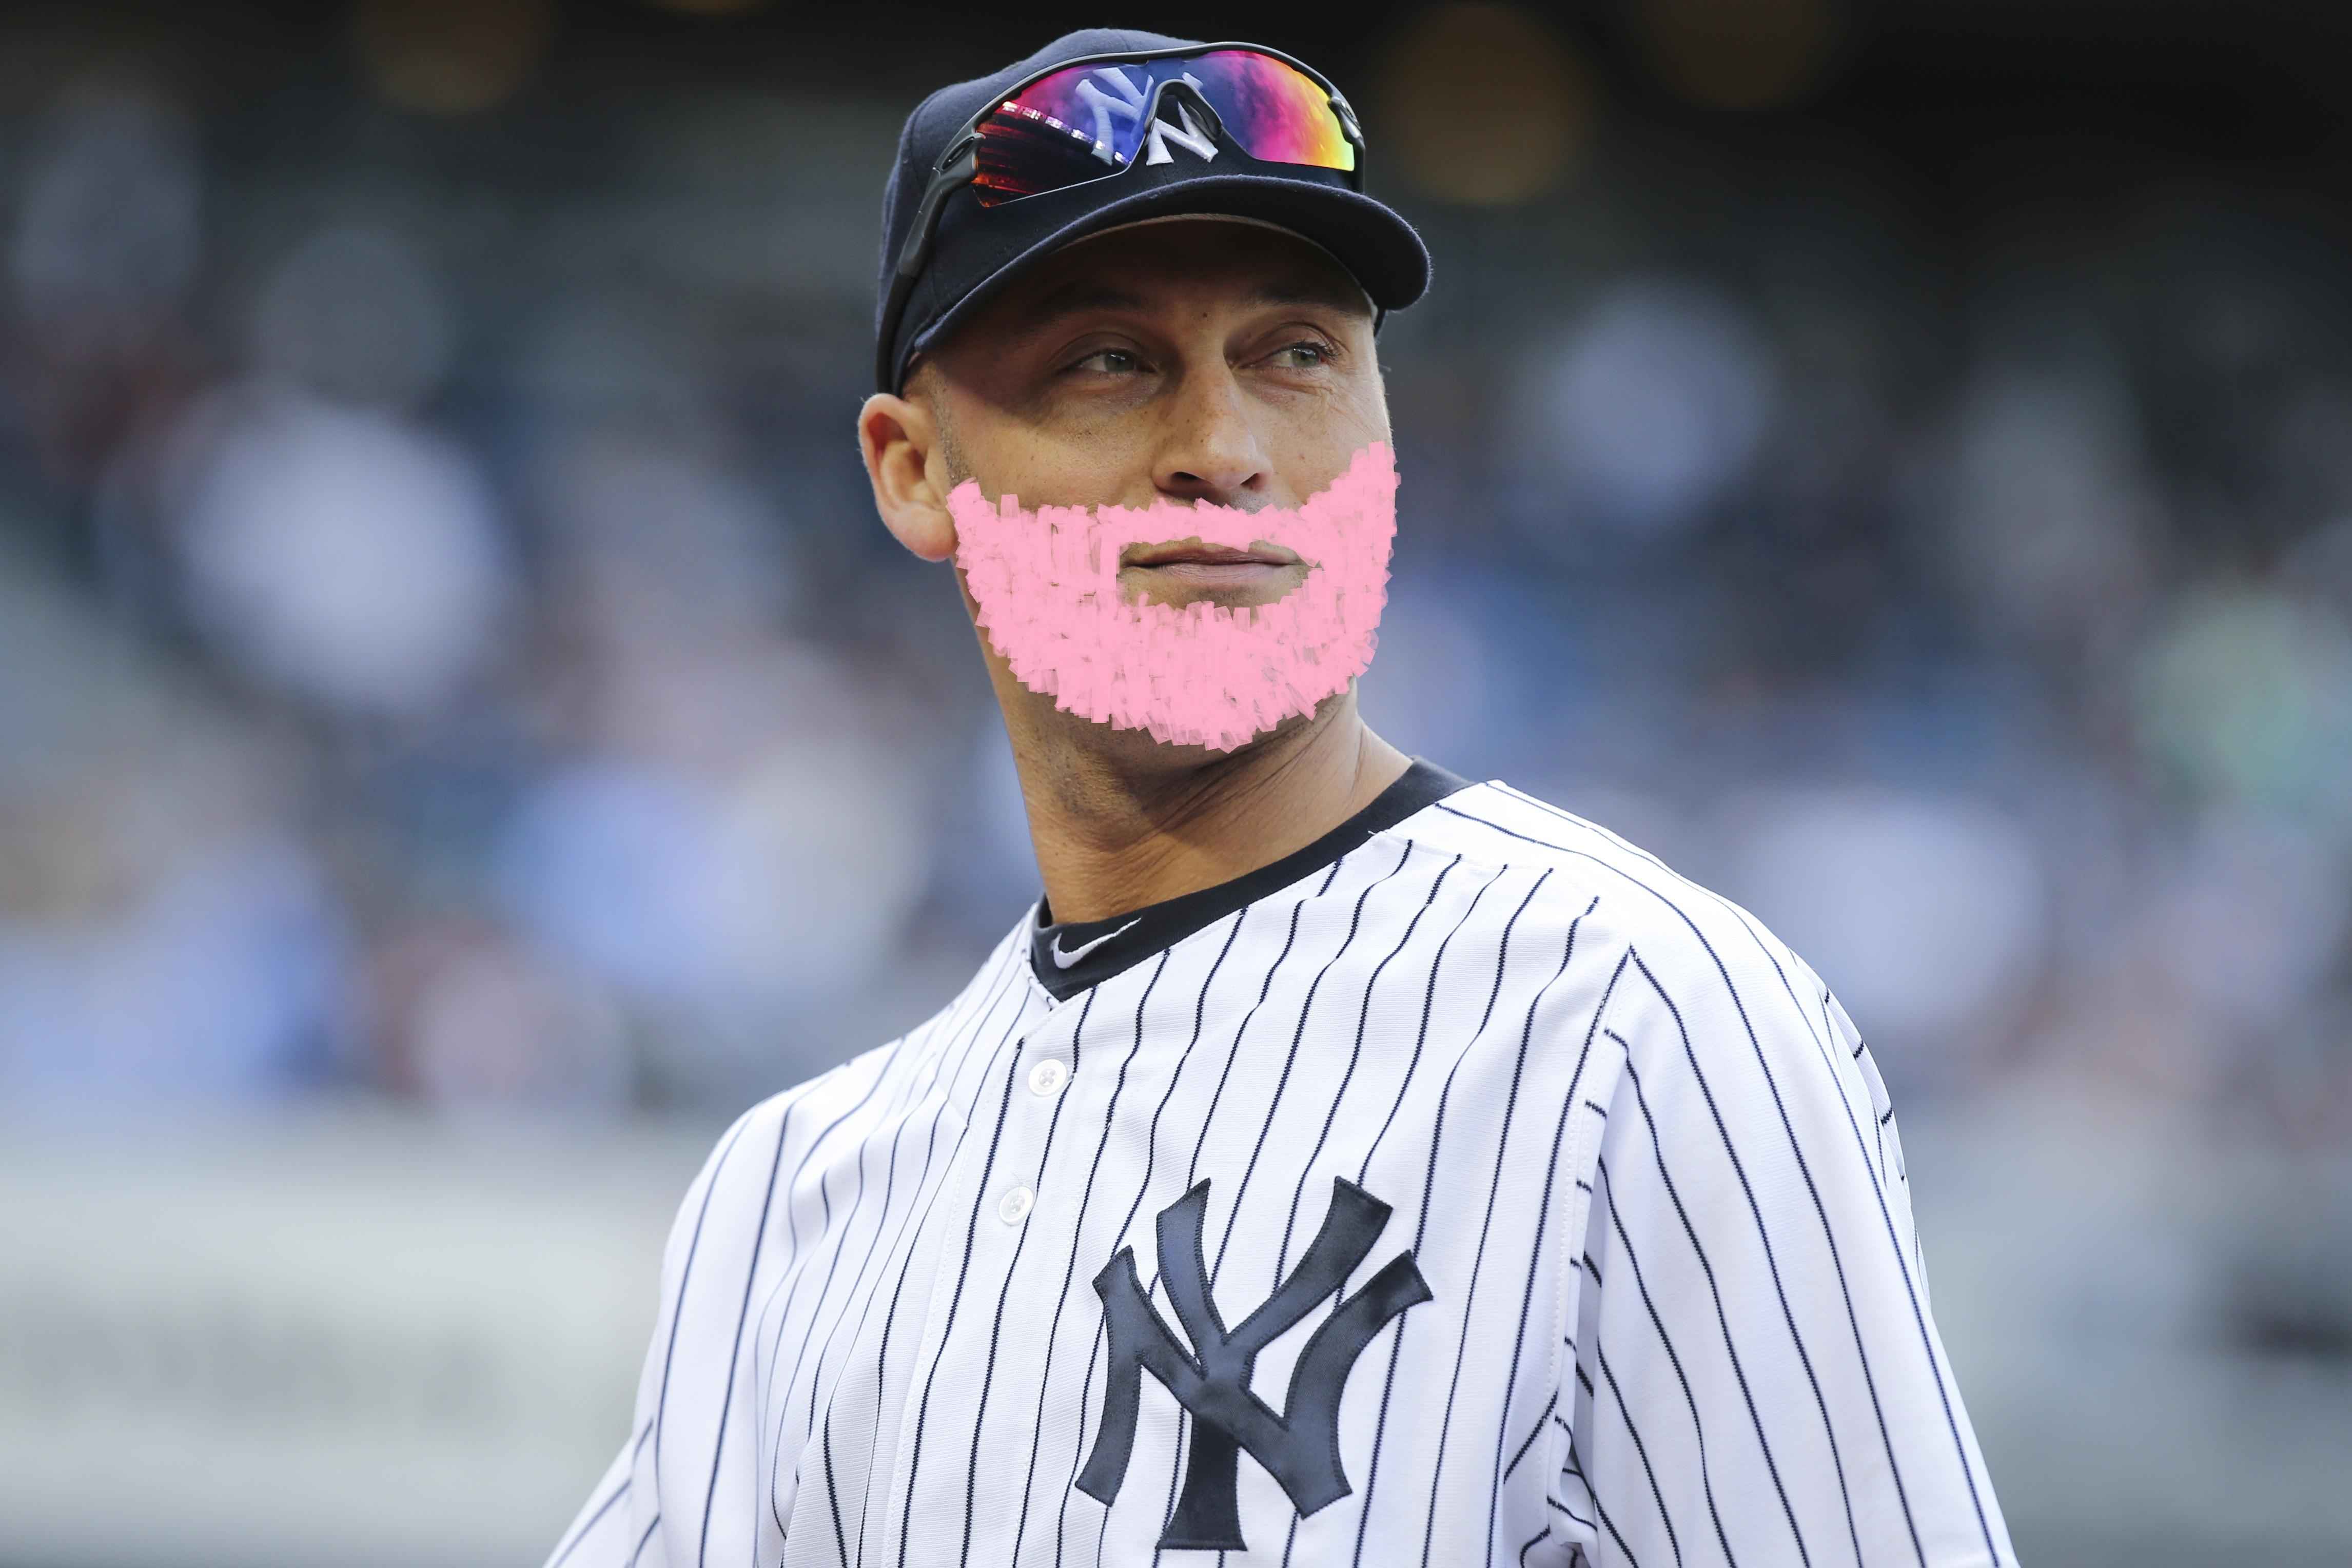 Jeter Pink Beard